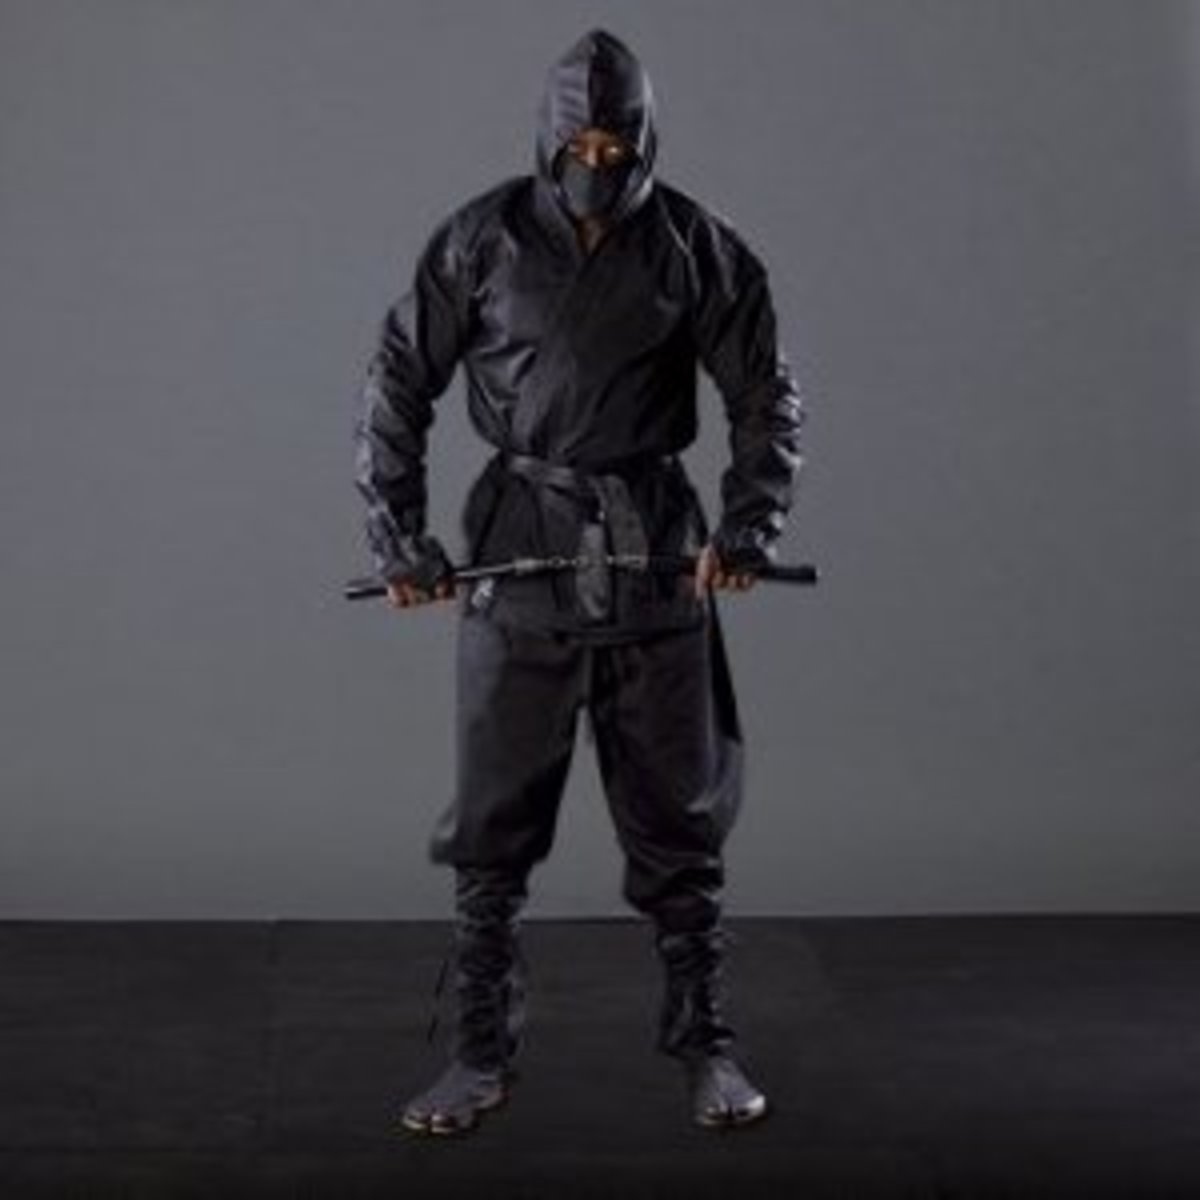 how-to-train-to-become-a-ninja